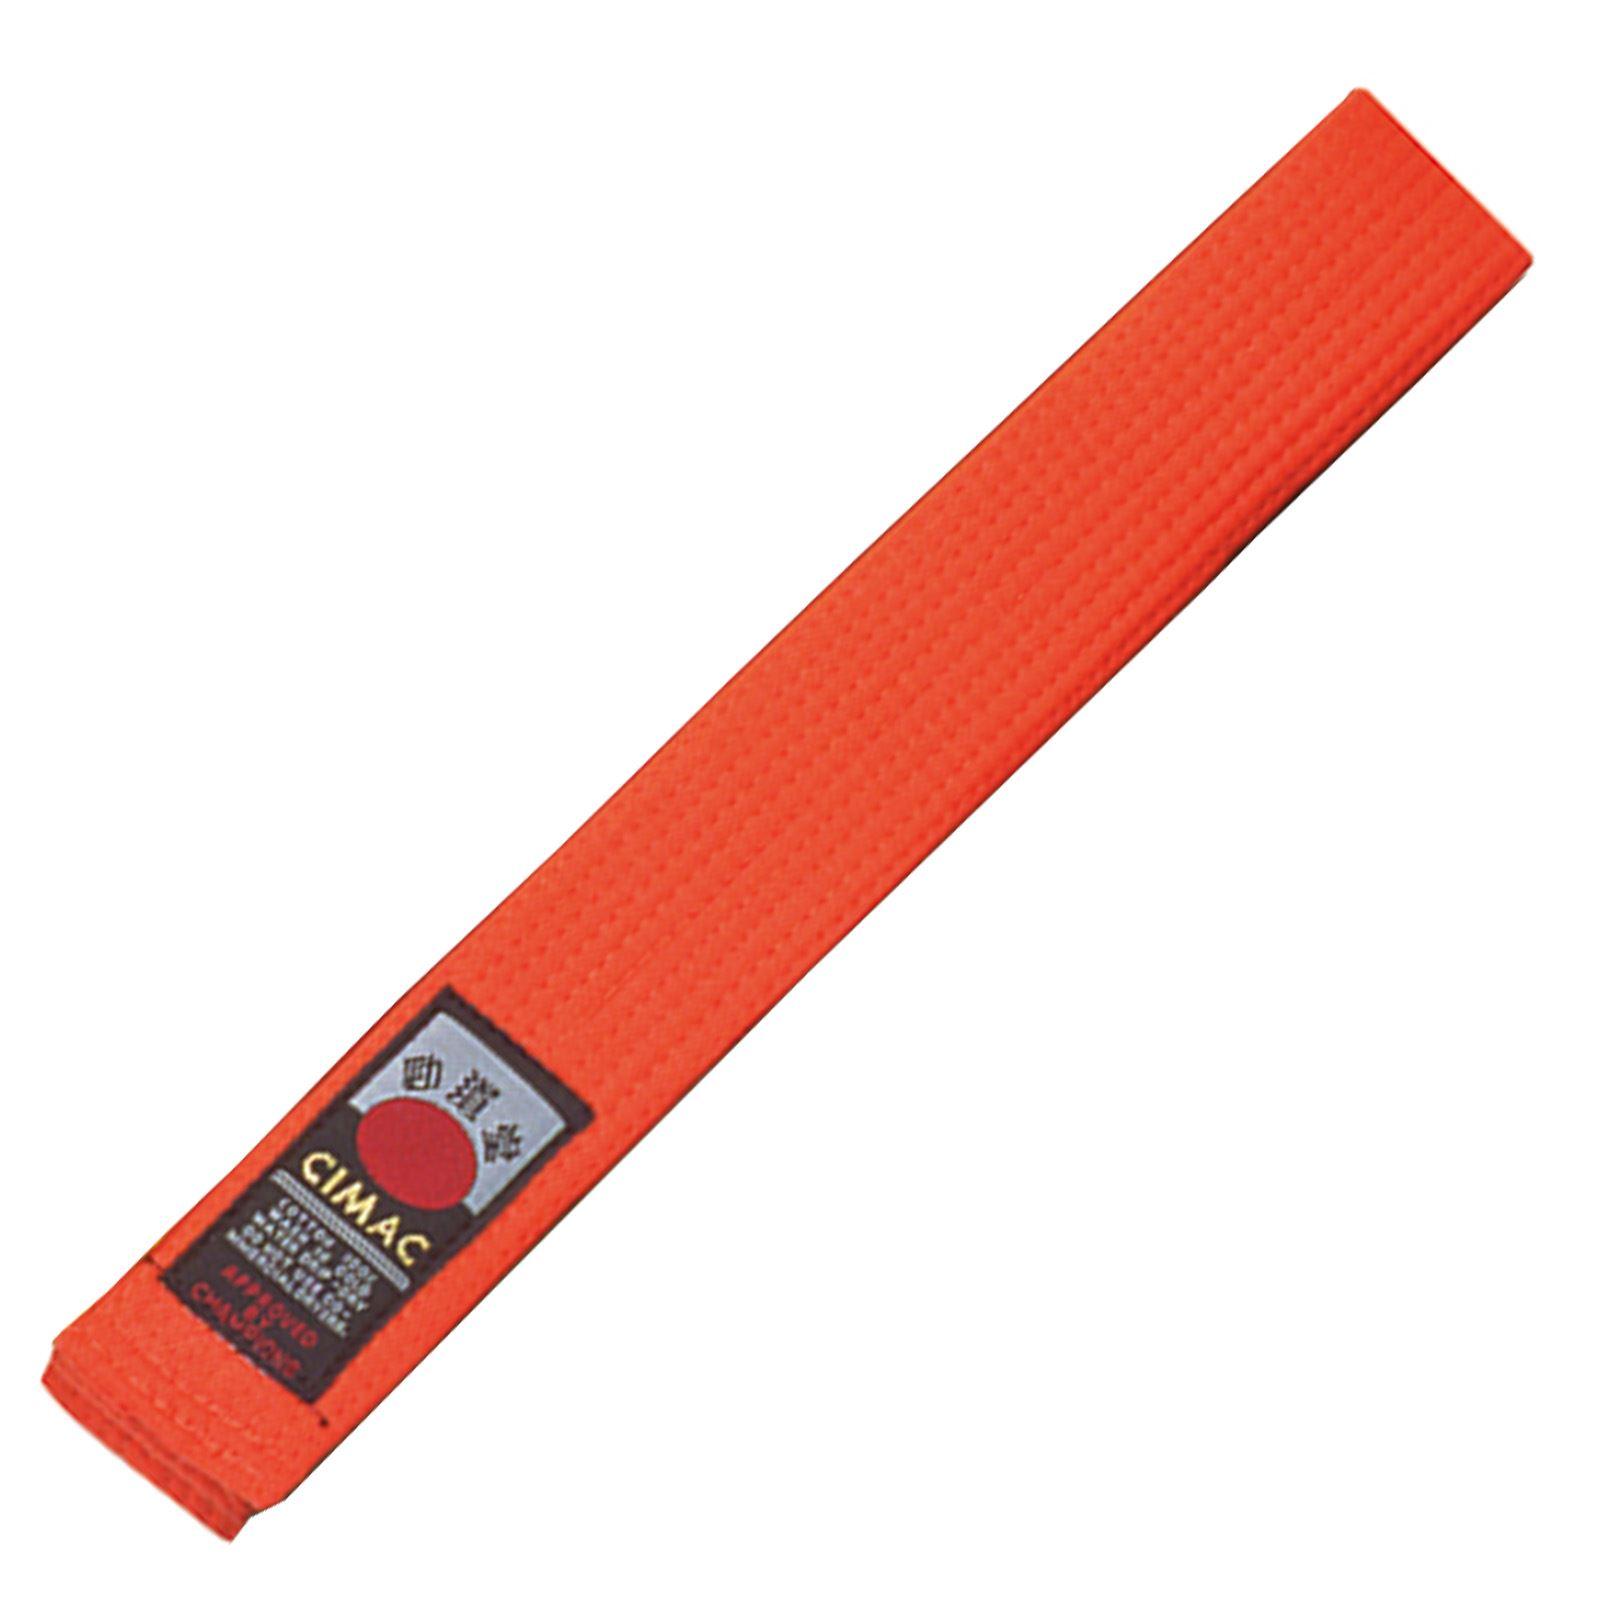 Cimac-Judo-Karate-Taekwondo-Plain-Coloured-Martial-Arts-Belt-UniformVarious-Size thumbnail 16